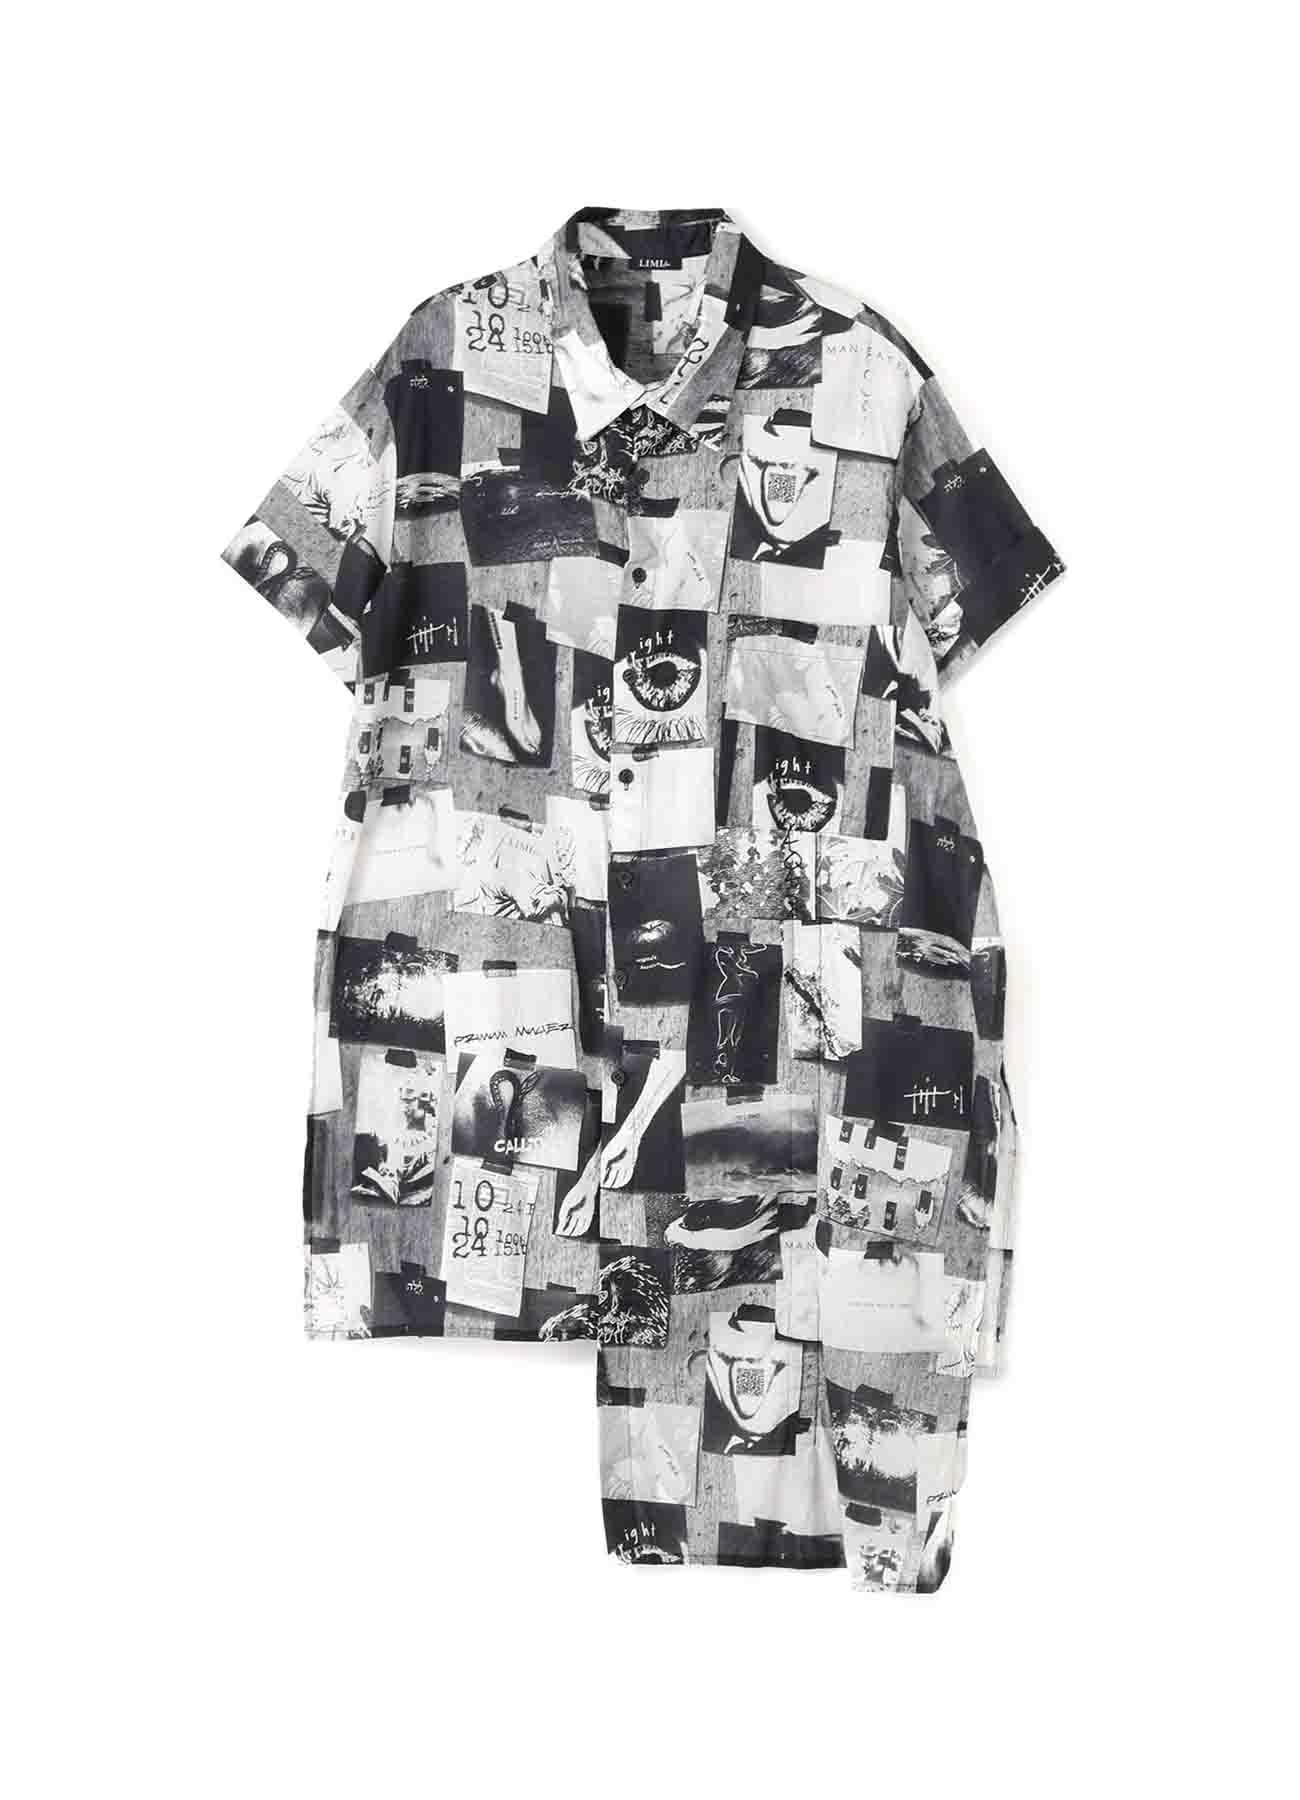 2021 Material Print Compass 2Way Half Sleeve Shirt